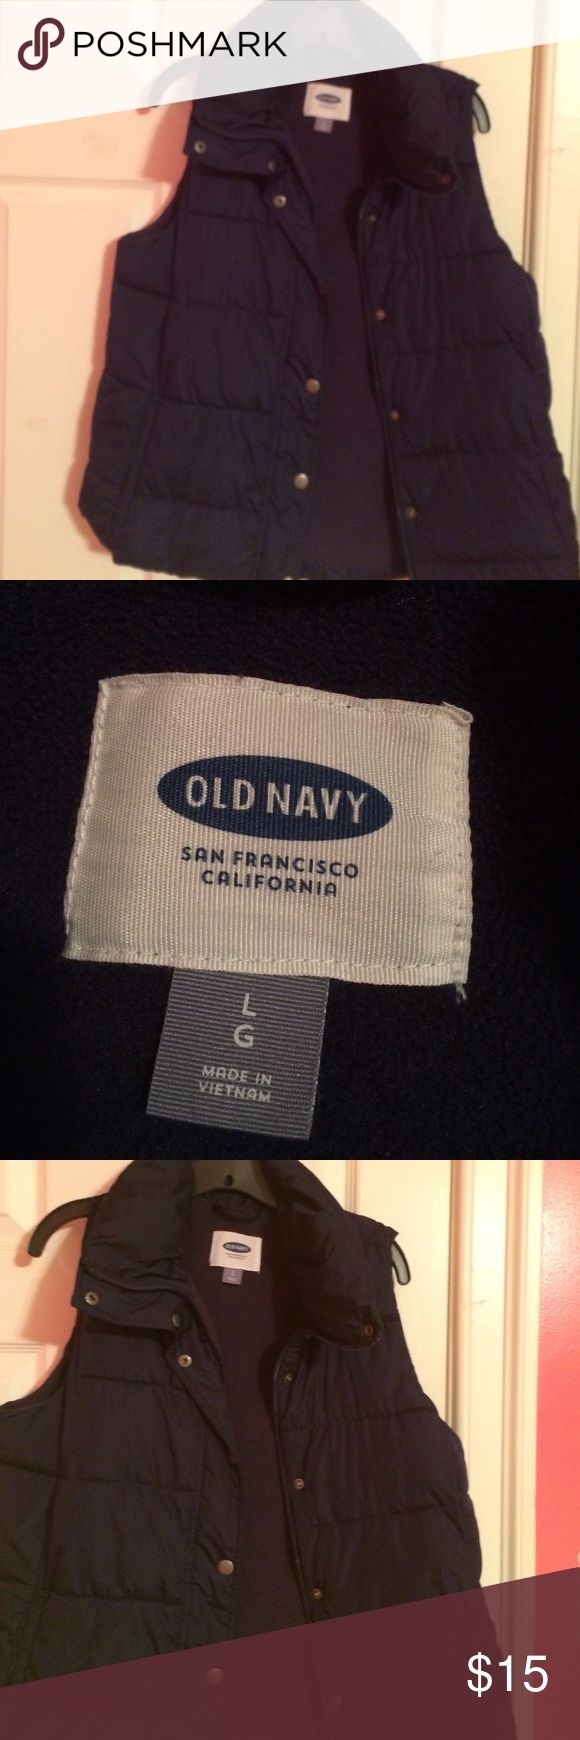 Old navy navy blue vest 2 pocket navy blue vest Old Navy Jackets & Coats Vests